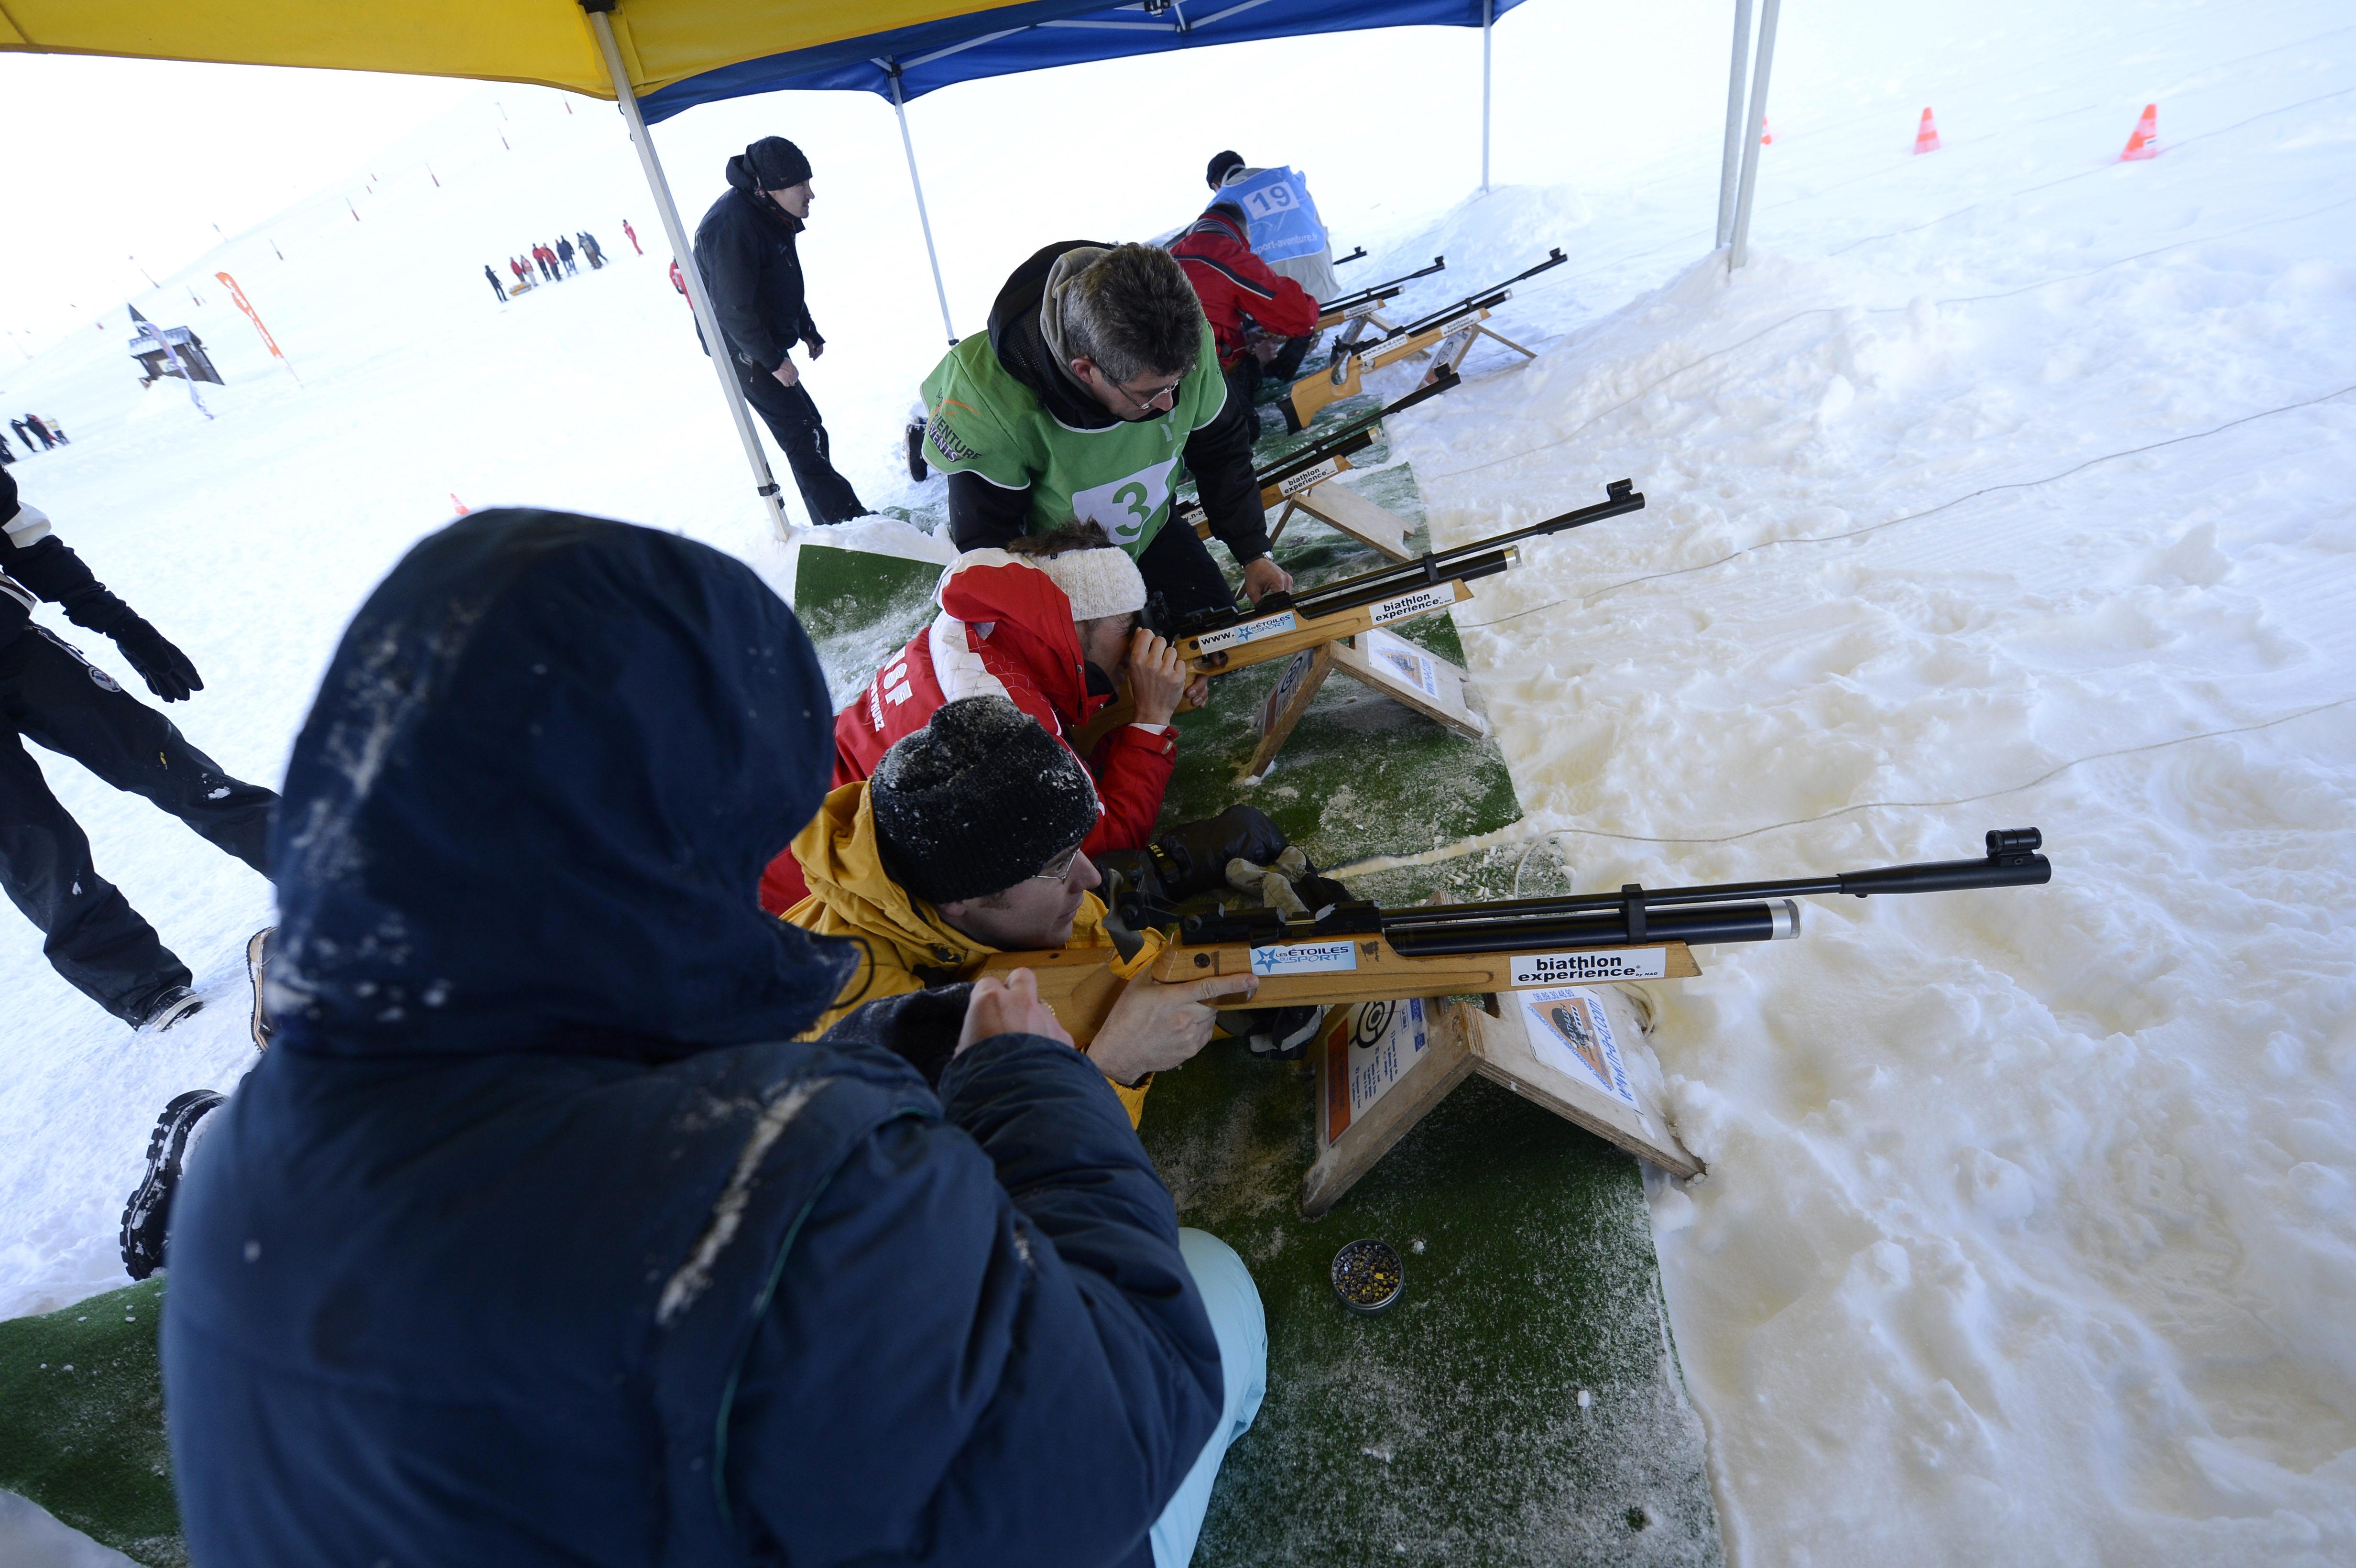 Activites - Groupes - Jura - hiver - Station des Rousses - Ski - Biathlon -EVG/EVJF - Anniversaire